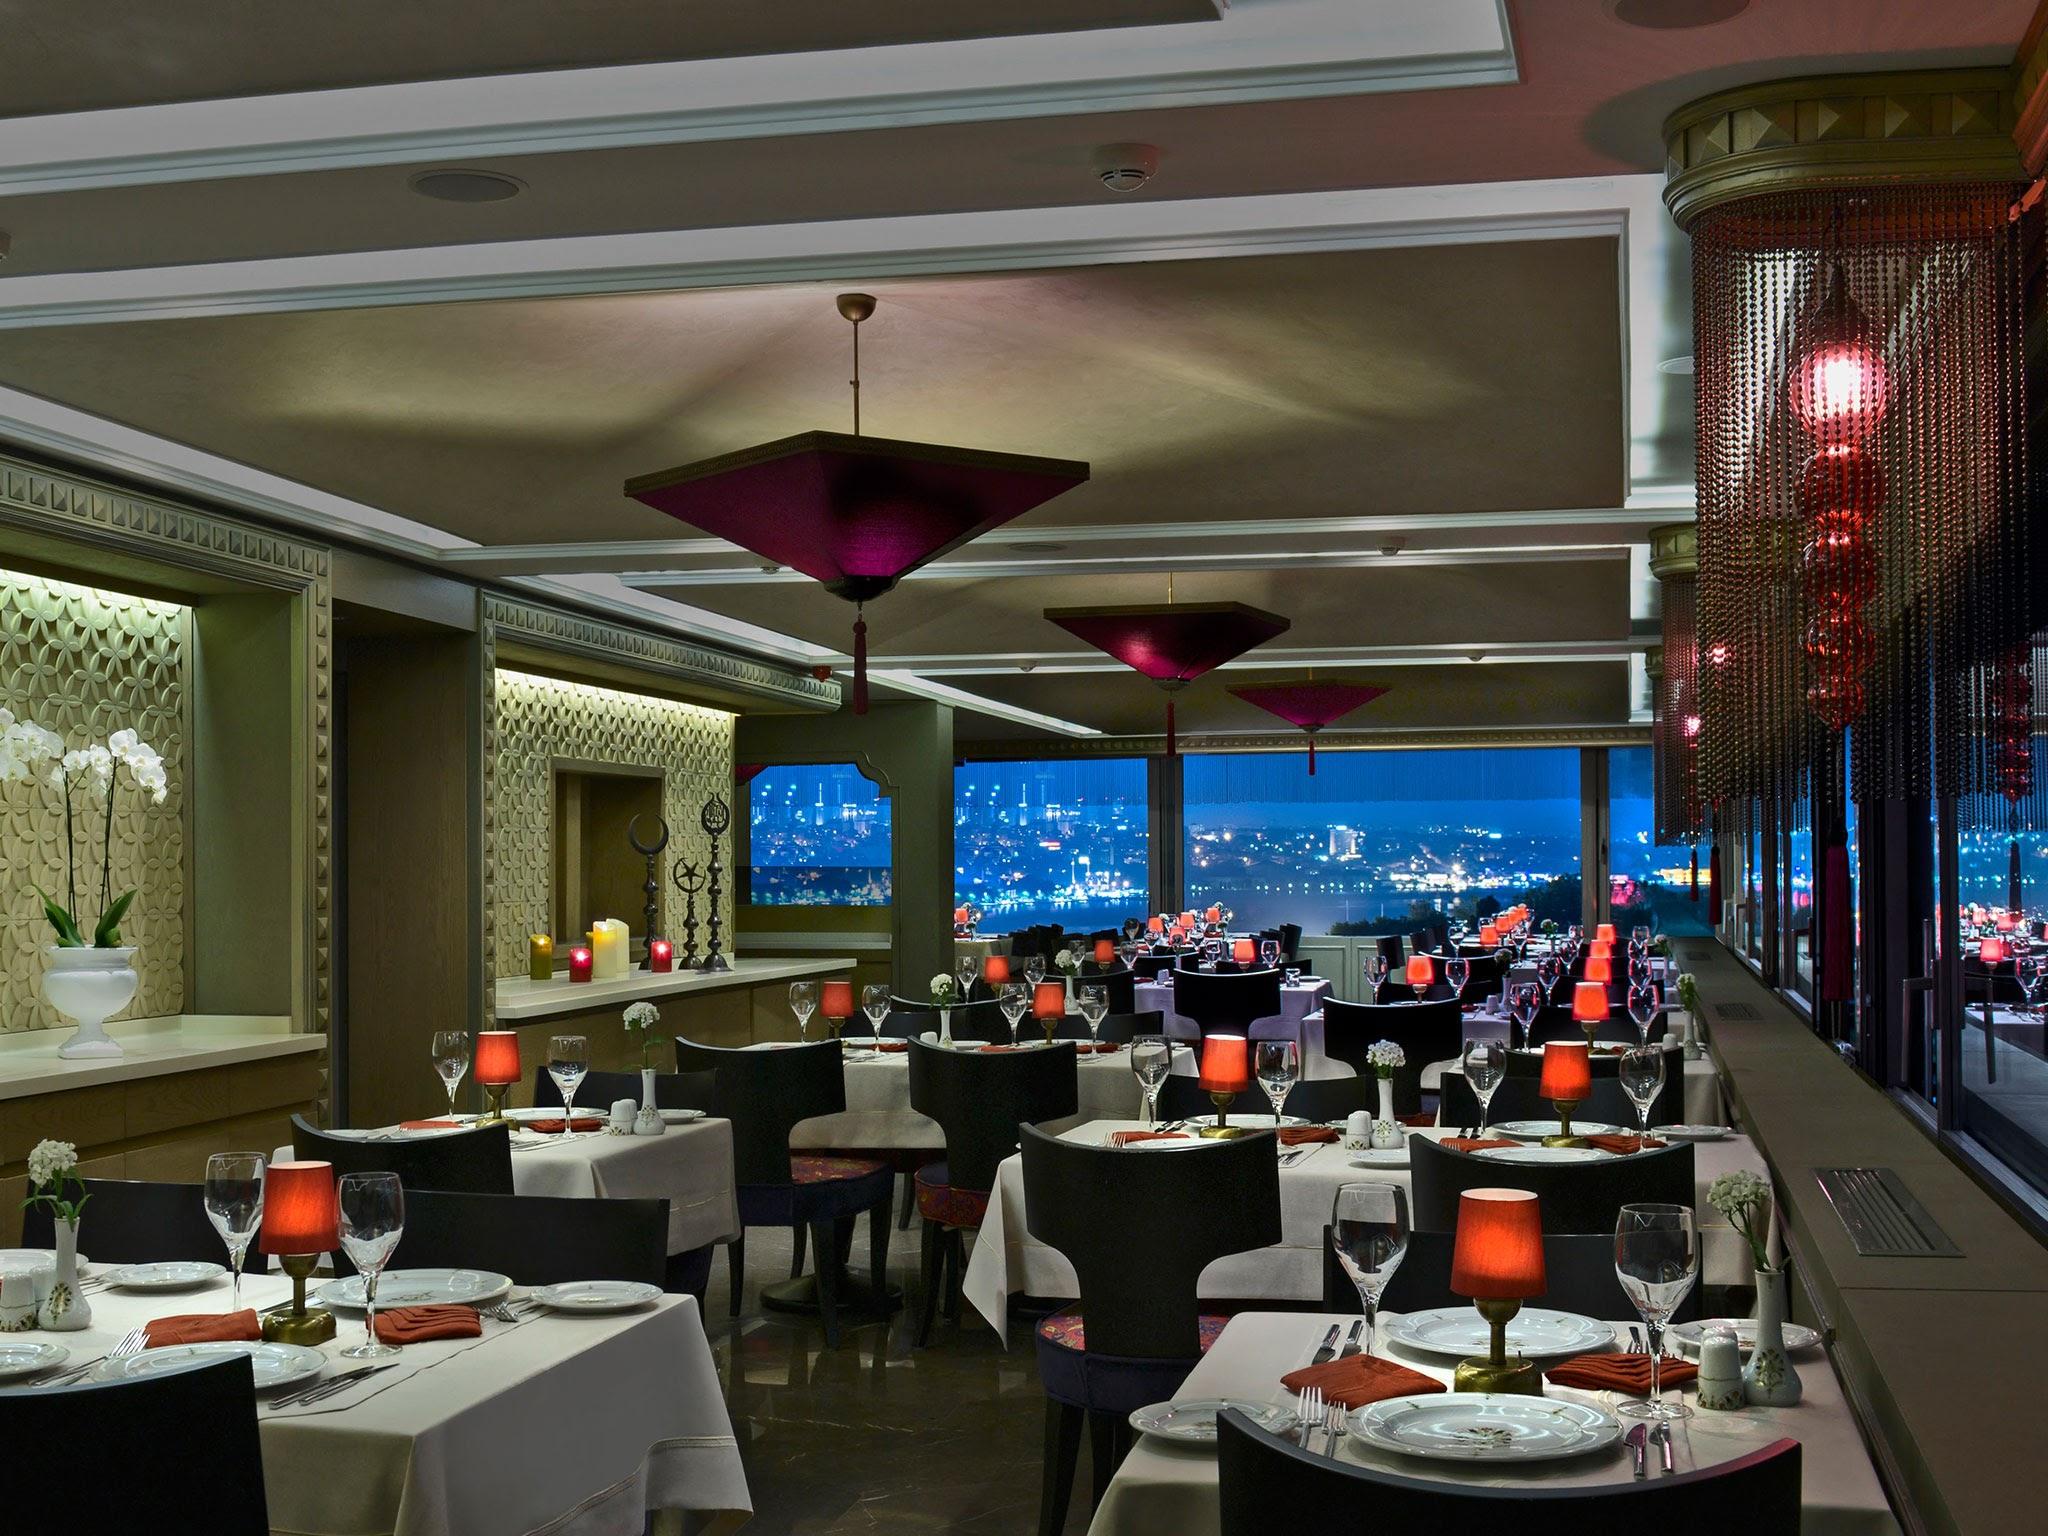 Olive_Anatolian_Restaurant_Dining_Area